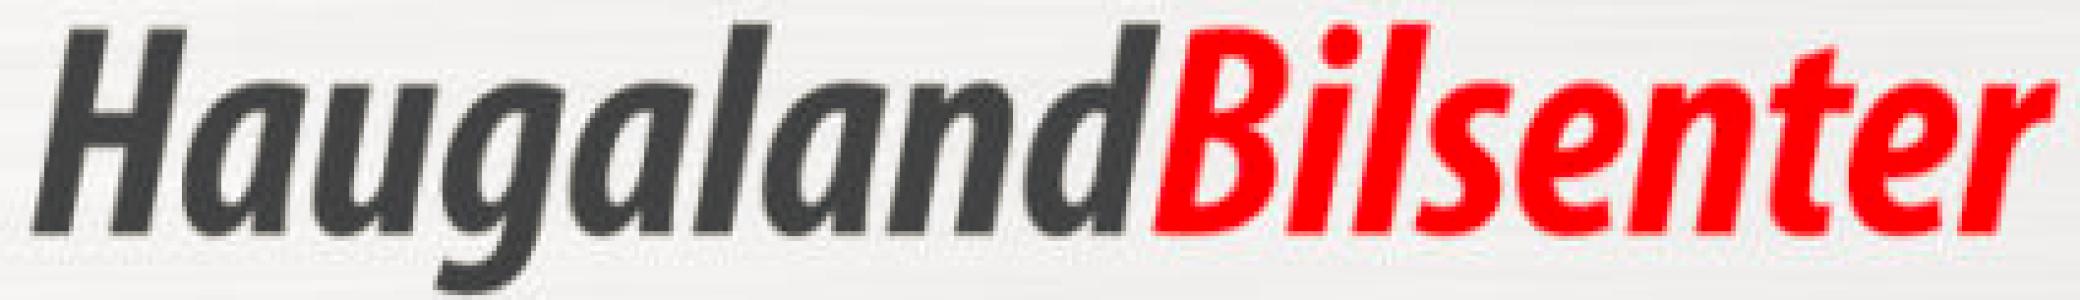 Haugaland Bilsenter